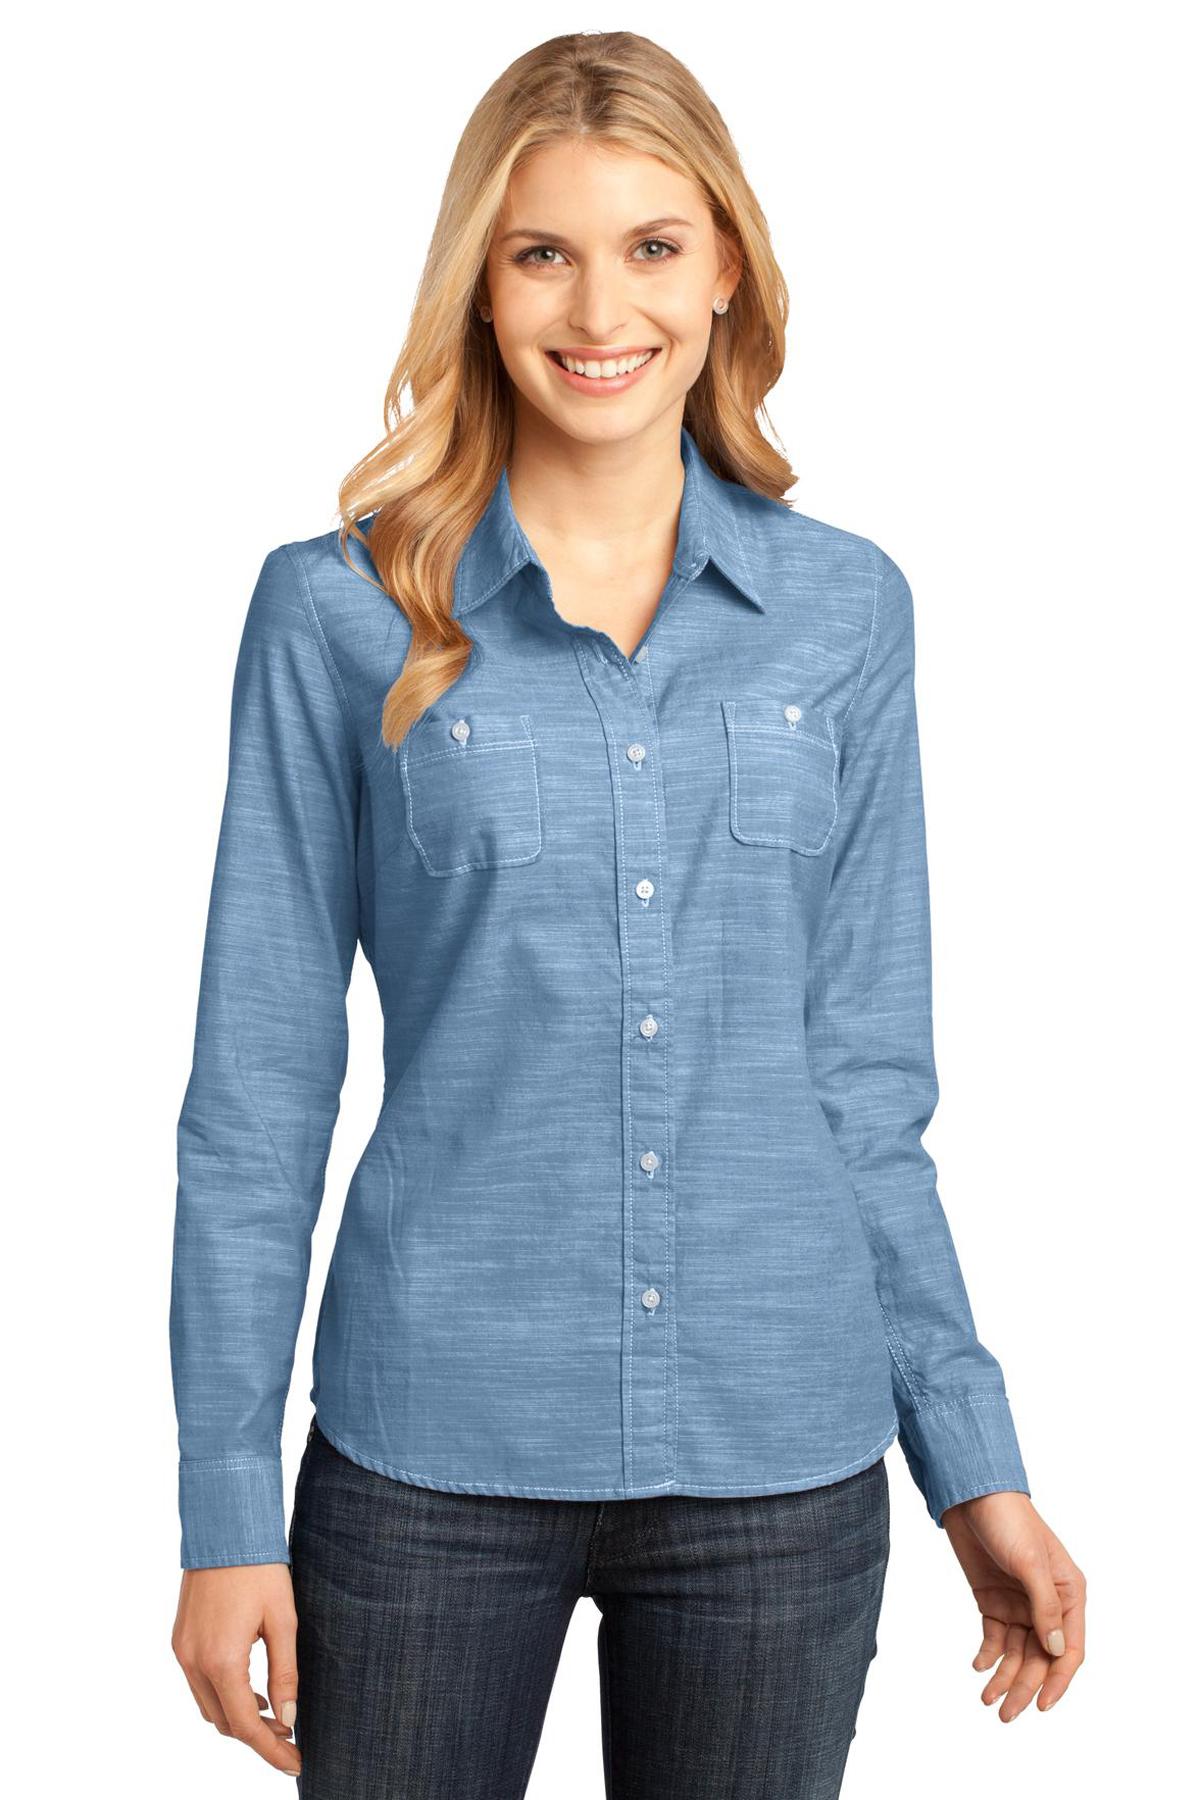 Woven-Shirts-Cotton-3